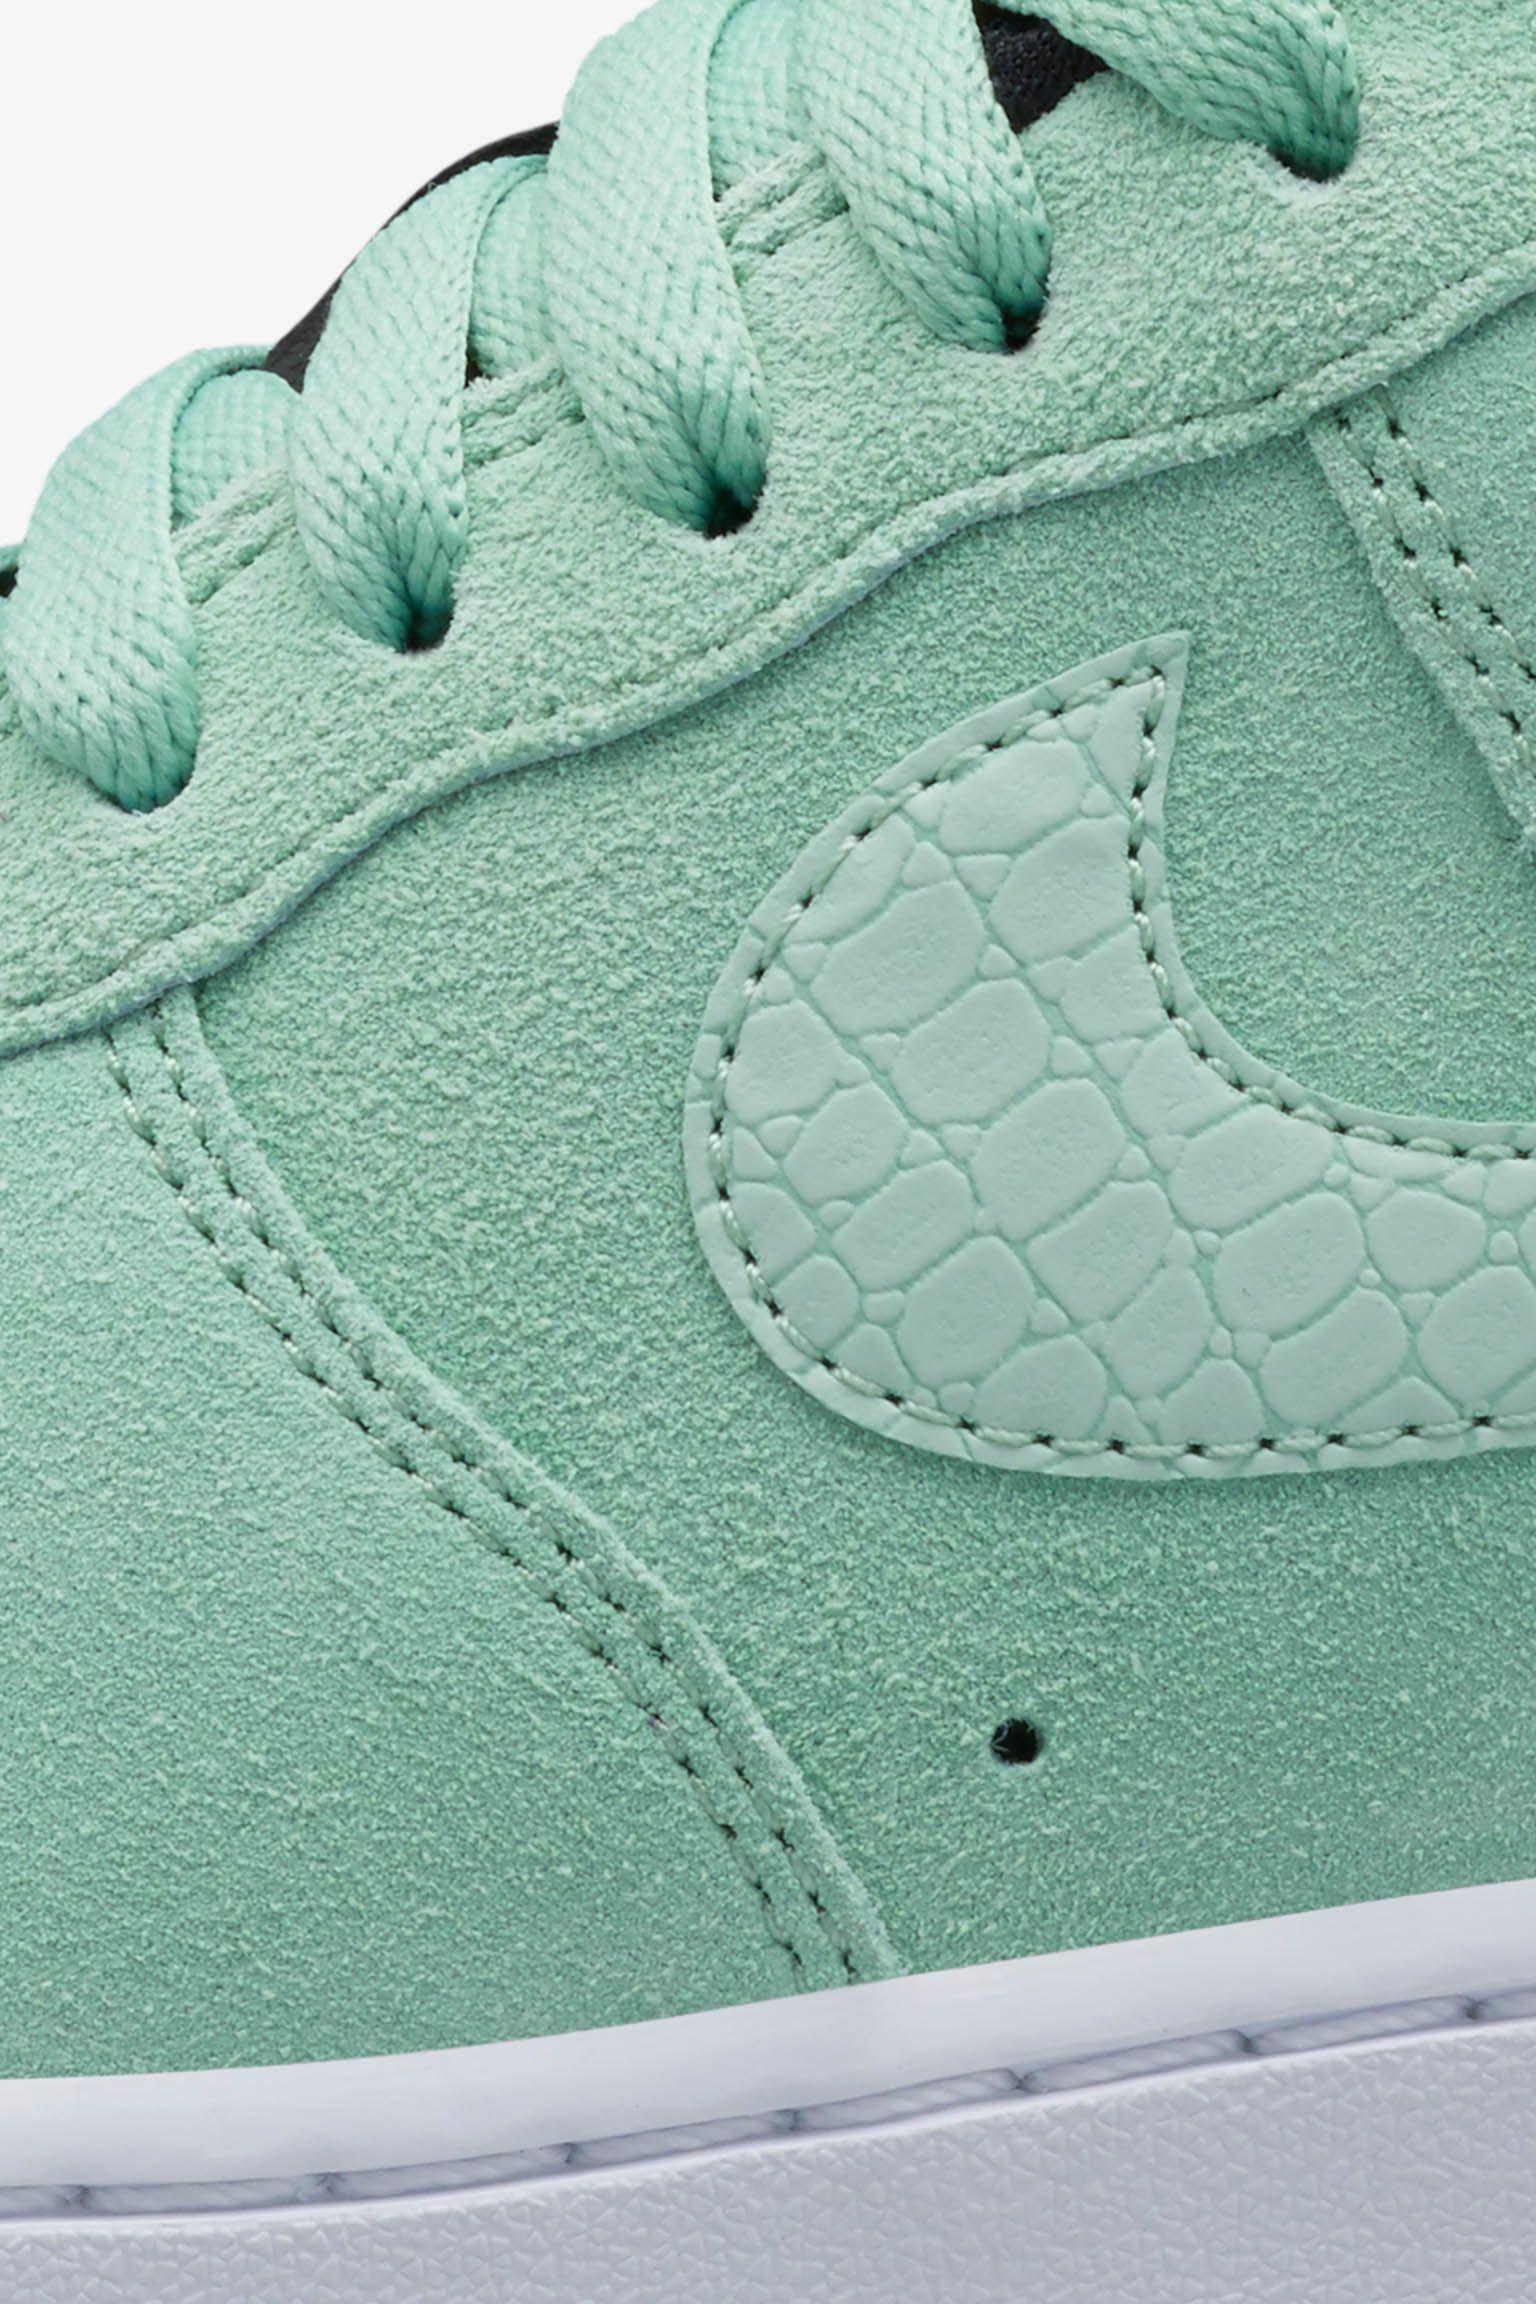 Women's Nike Air Force 1 'Enamel Green'. Nike SNKRS